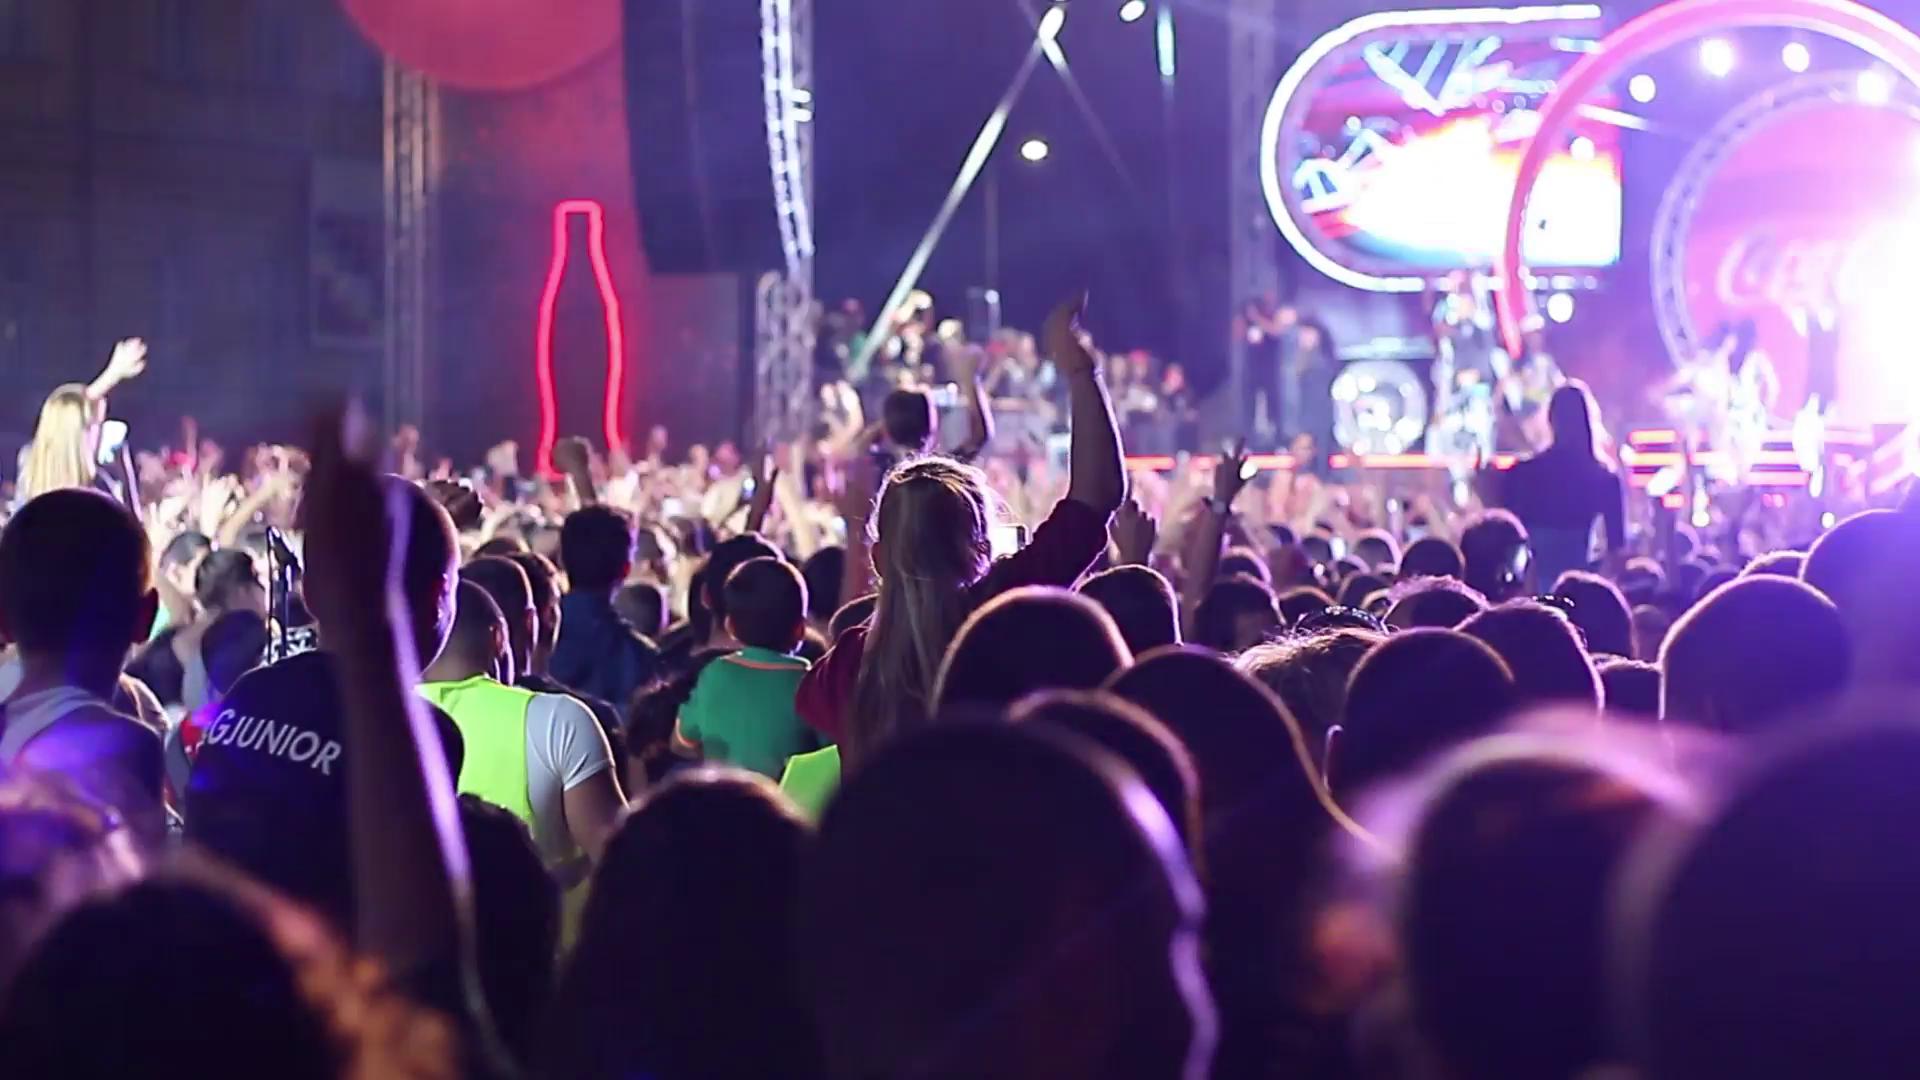 Sofia, Bulgaria - 19 SEP 2015: Huge crowd of young people having fun ...